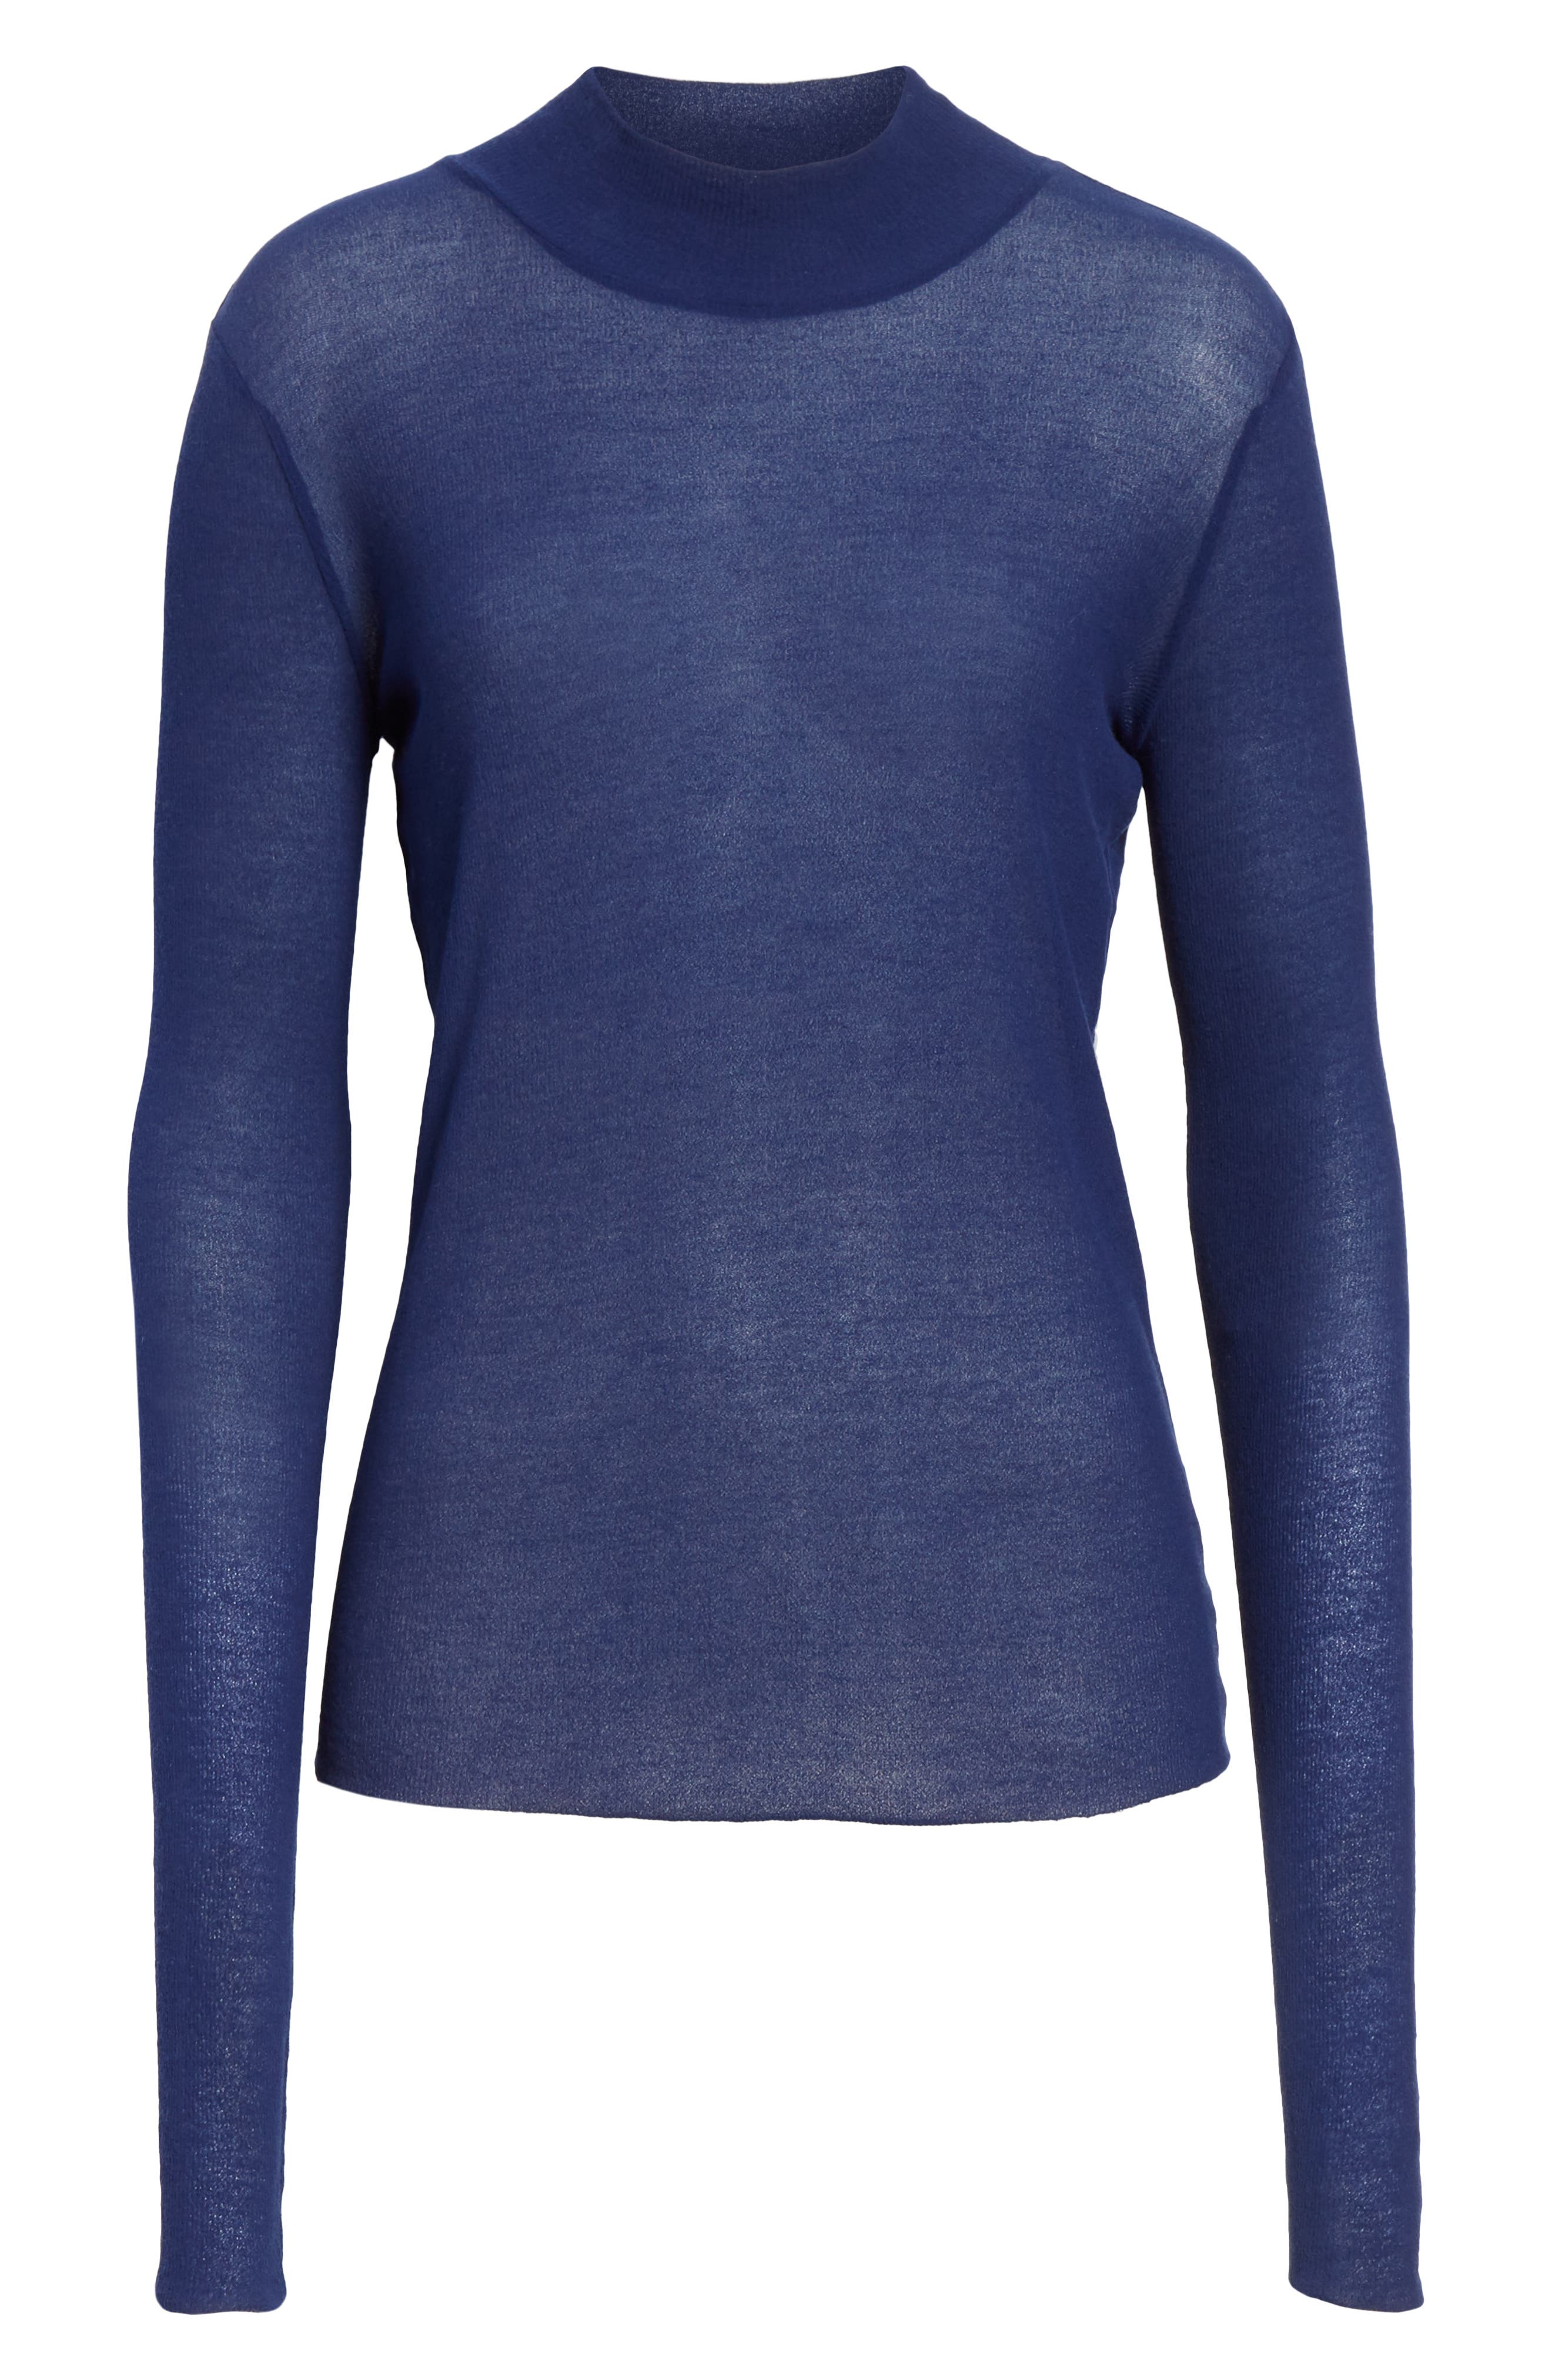 Turtleneck Sweater,                             Alternate thumbnail 6, color,                             406